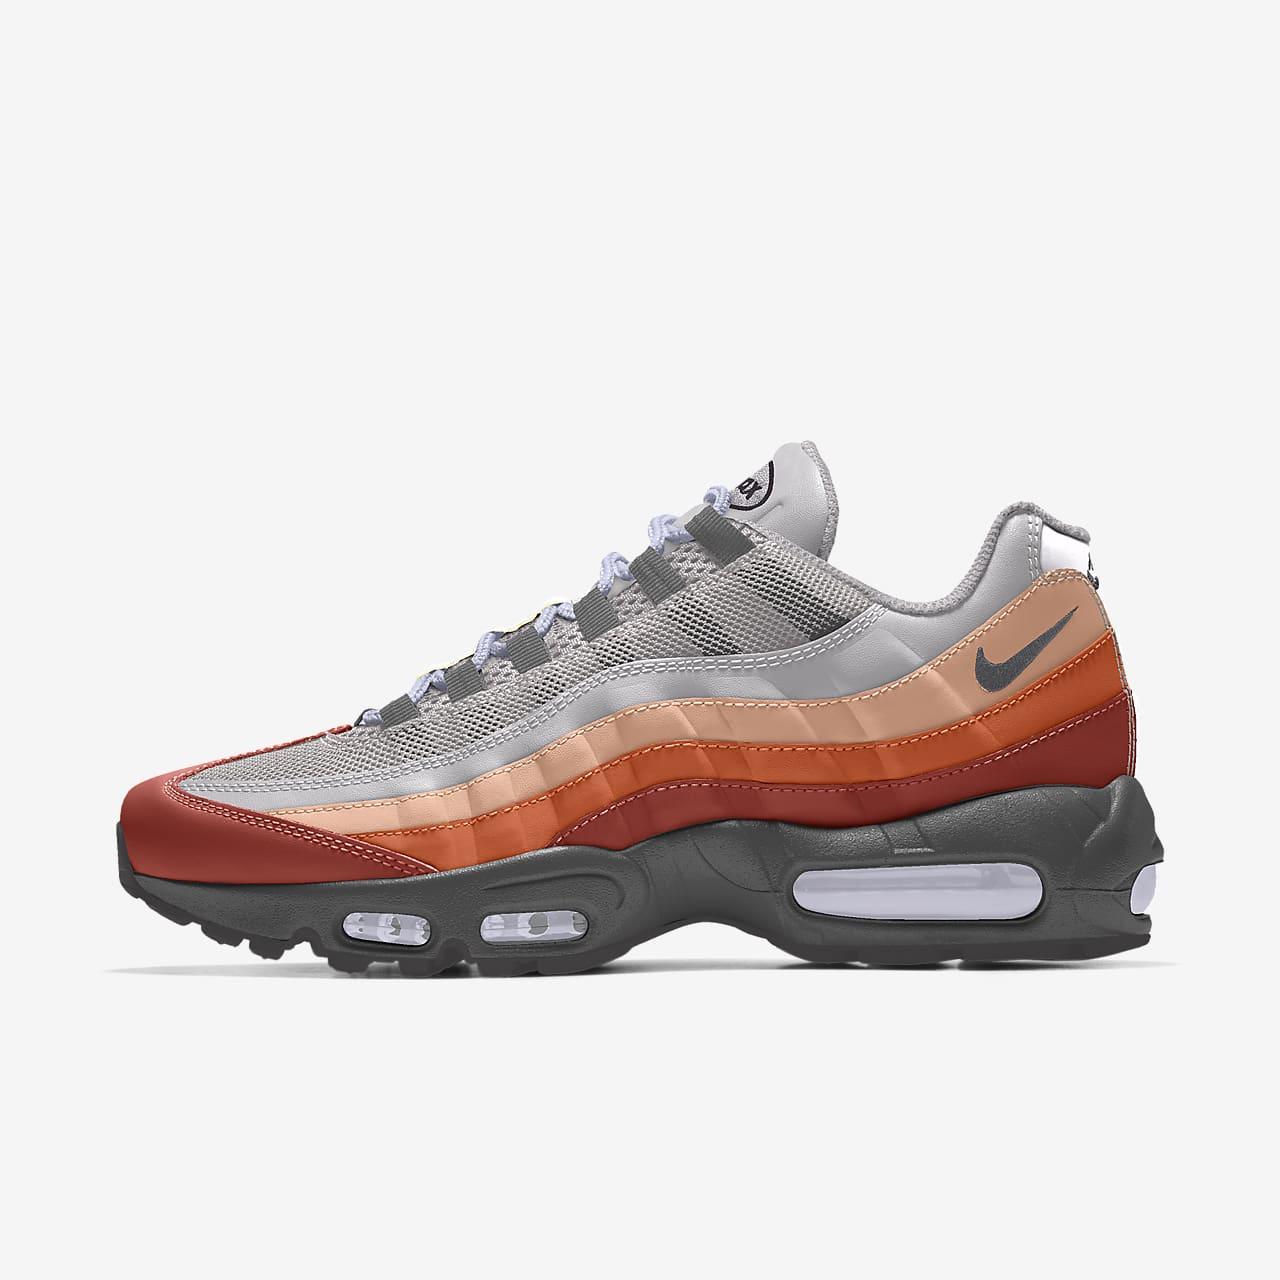 Nike Air Max 95 Unlocked By You Custom Shoe